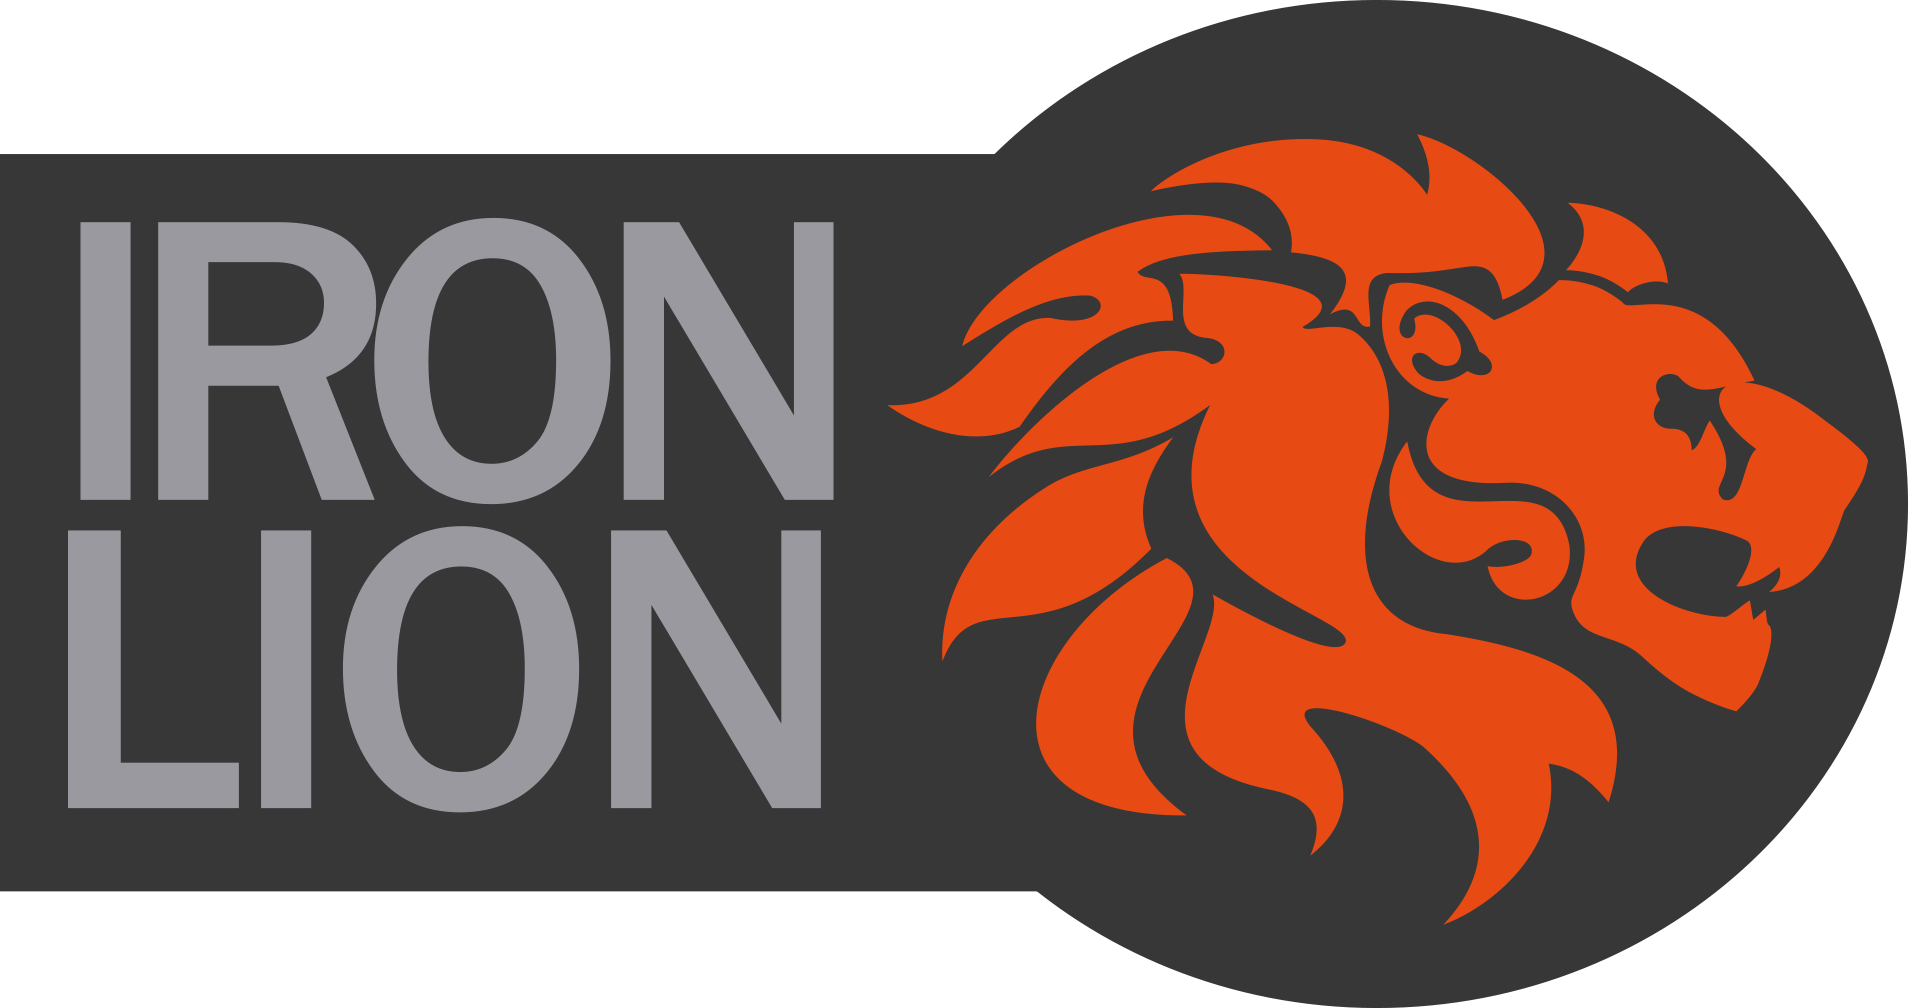 Ironlion